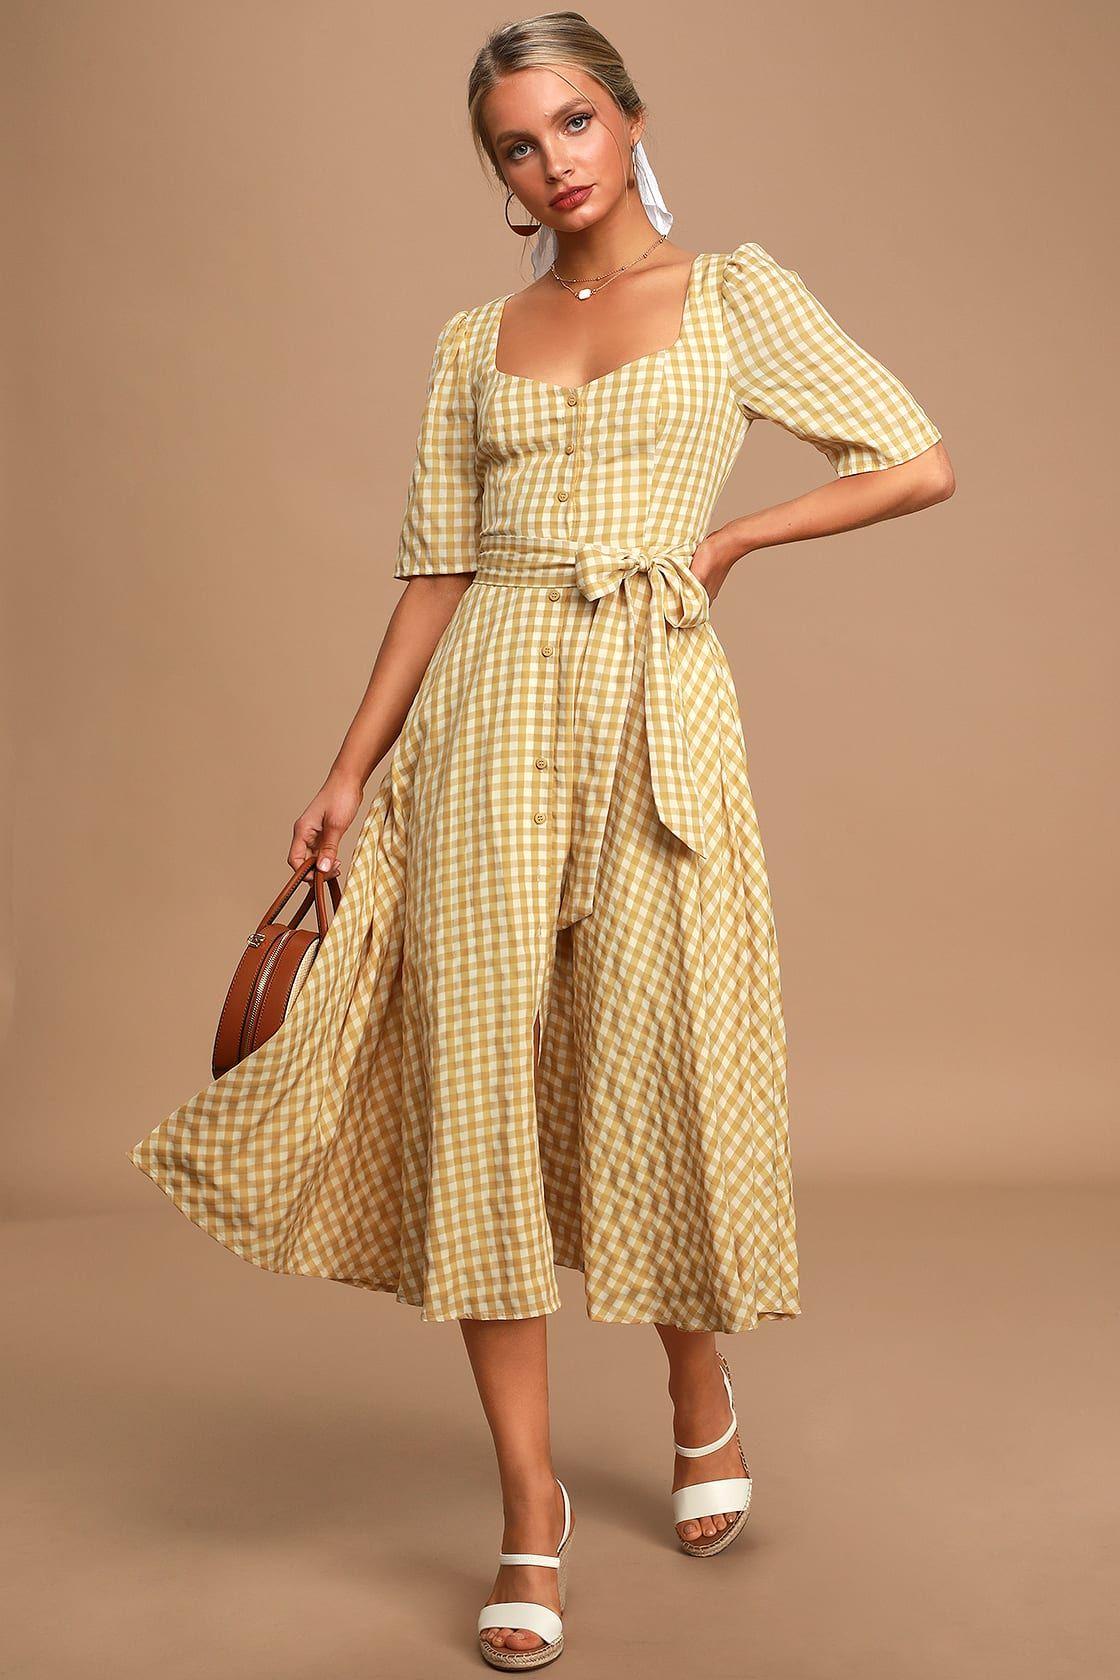 Sweet Little Thing Mustard Yellow Gingham Button Up Midi Dress In 2021 Midi Dress Midi Flare Skirt Lace Midi Dress [ 1680 x 1120 Pixel ]